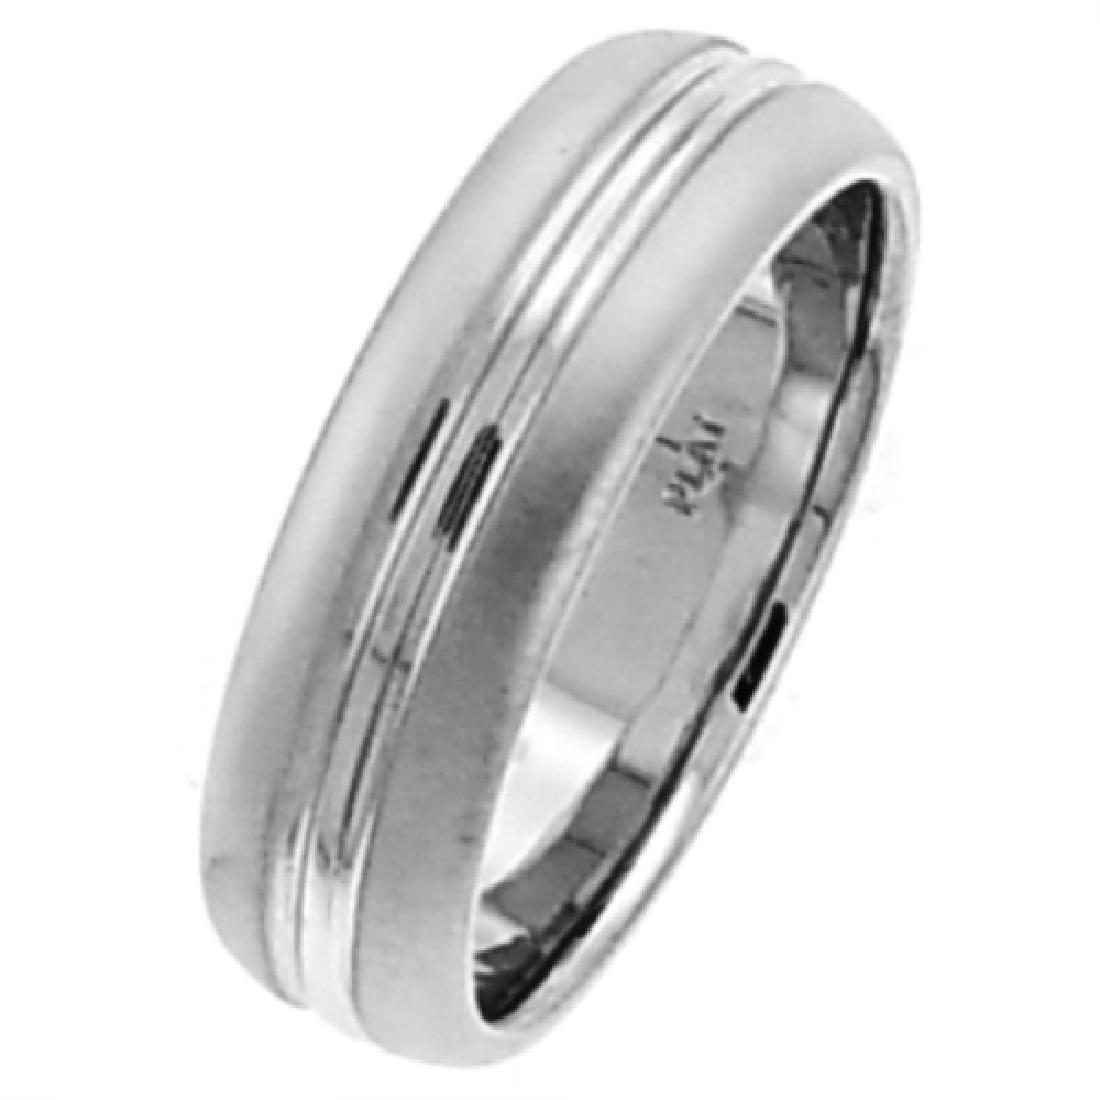 6 MM 14K White Gold Wedding Band Size 10